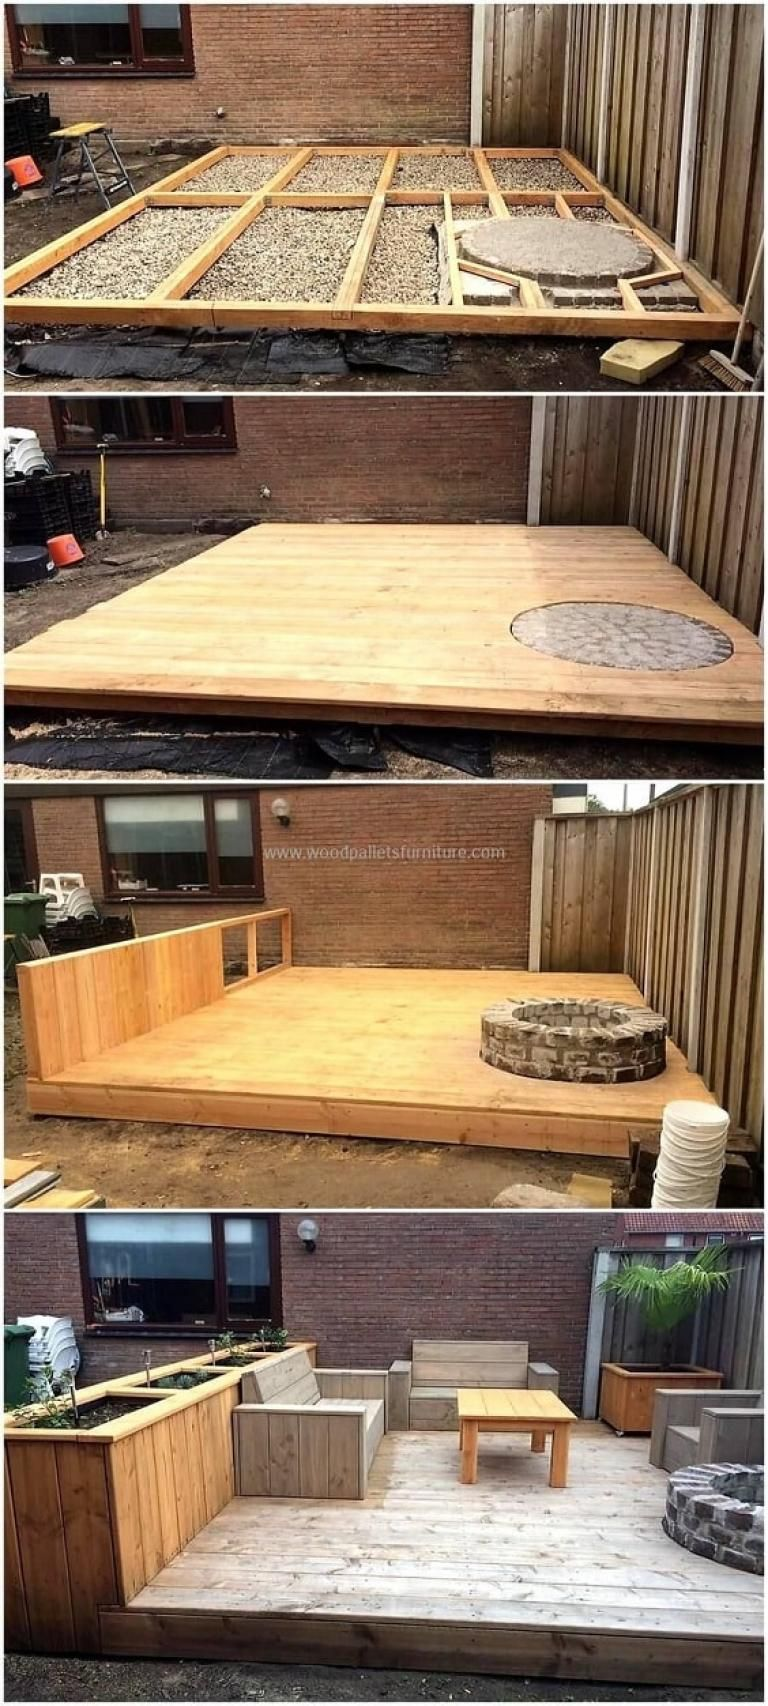 Woodworking Plans Patio Furniture: Admirable DIY Pallet Patio Terrace Ideas